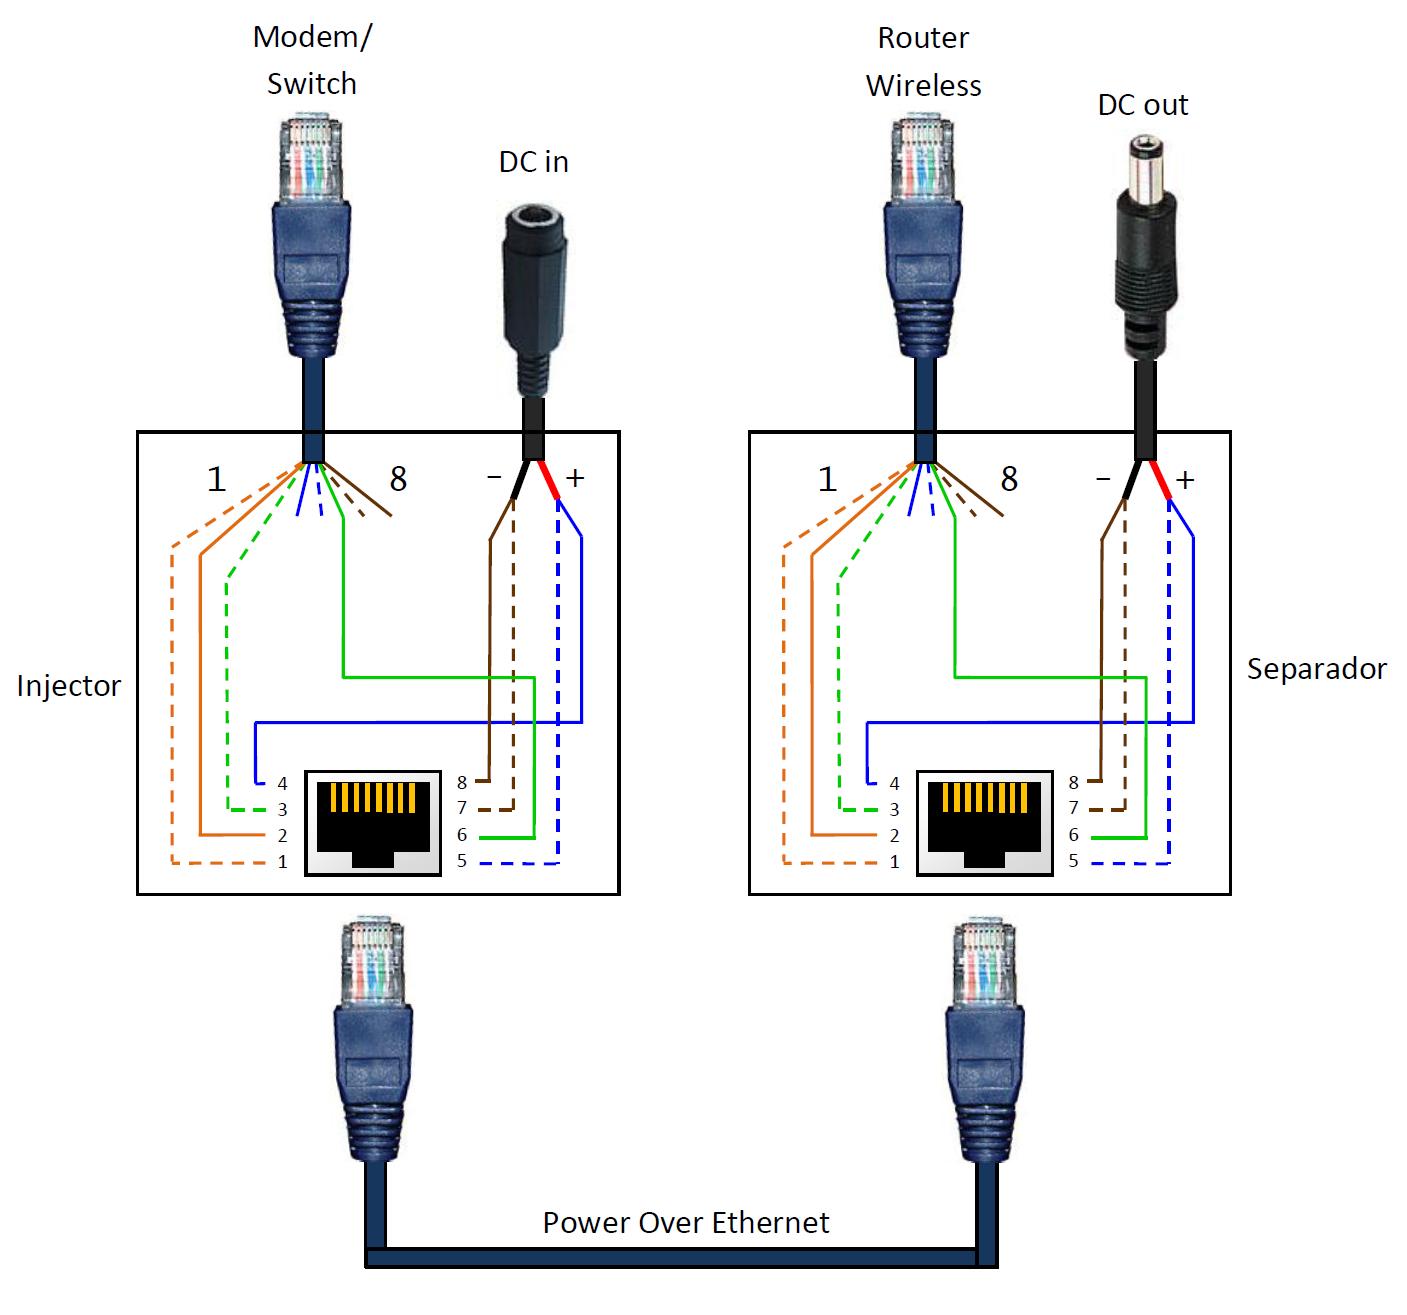 hight resolution of poe rj45 pinout diagram wiring diagram poe ip camera wiringpoe rj45 pinout diagram wiring diagram